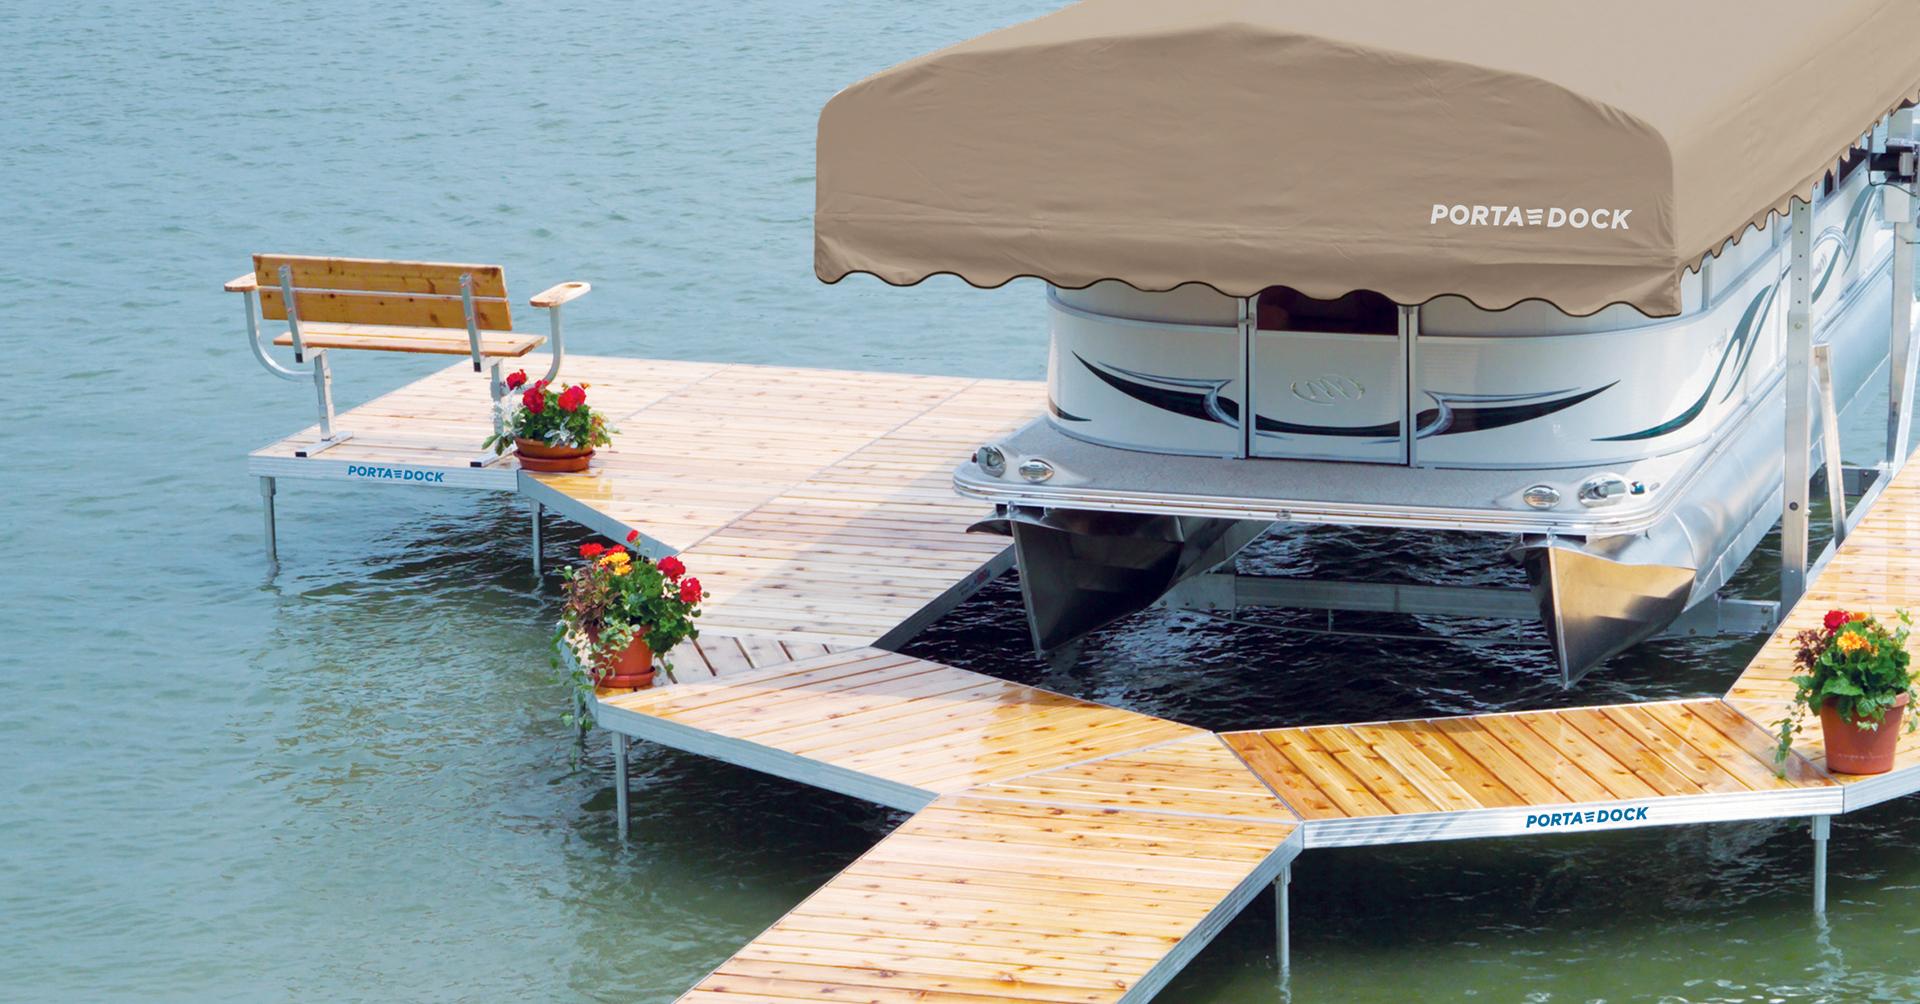 Porta-Dock post dock with Cedar decking